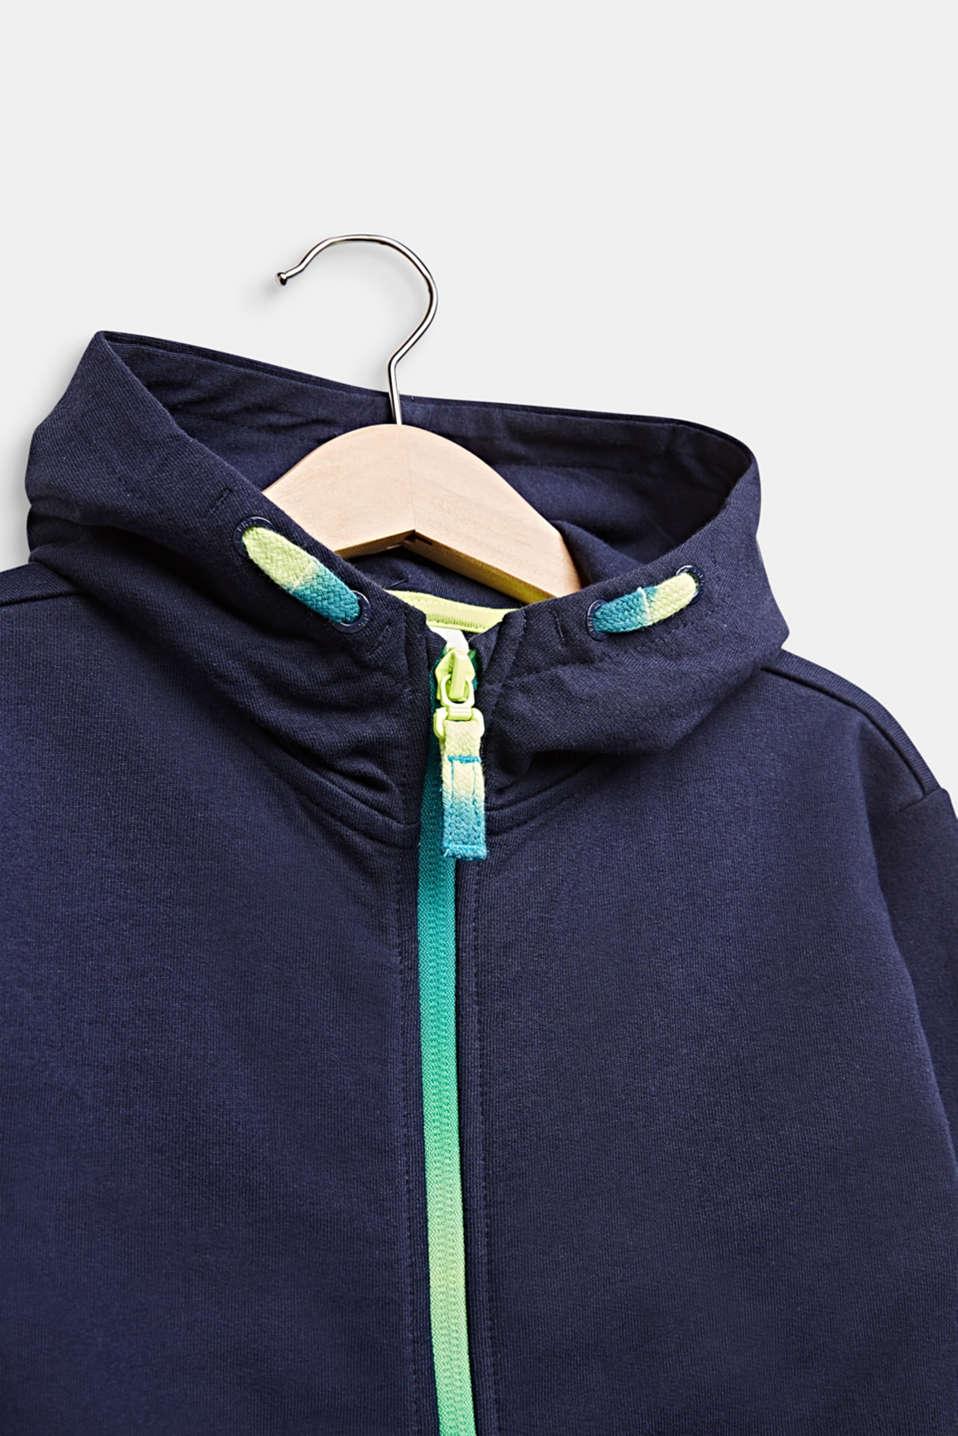 Sweatshirt fabric cardigan with logo ties, 100% cotton, MIDNIGHT BLUE, detail image number 4